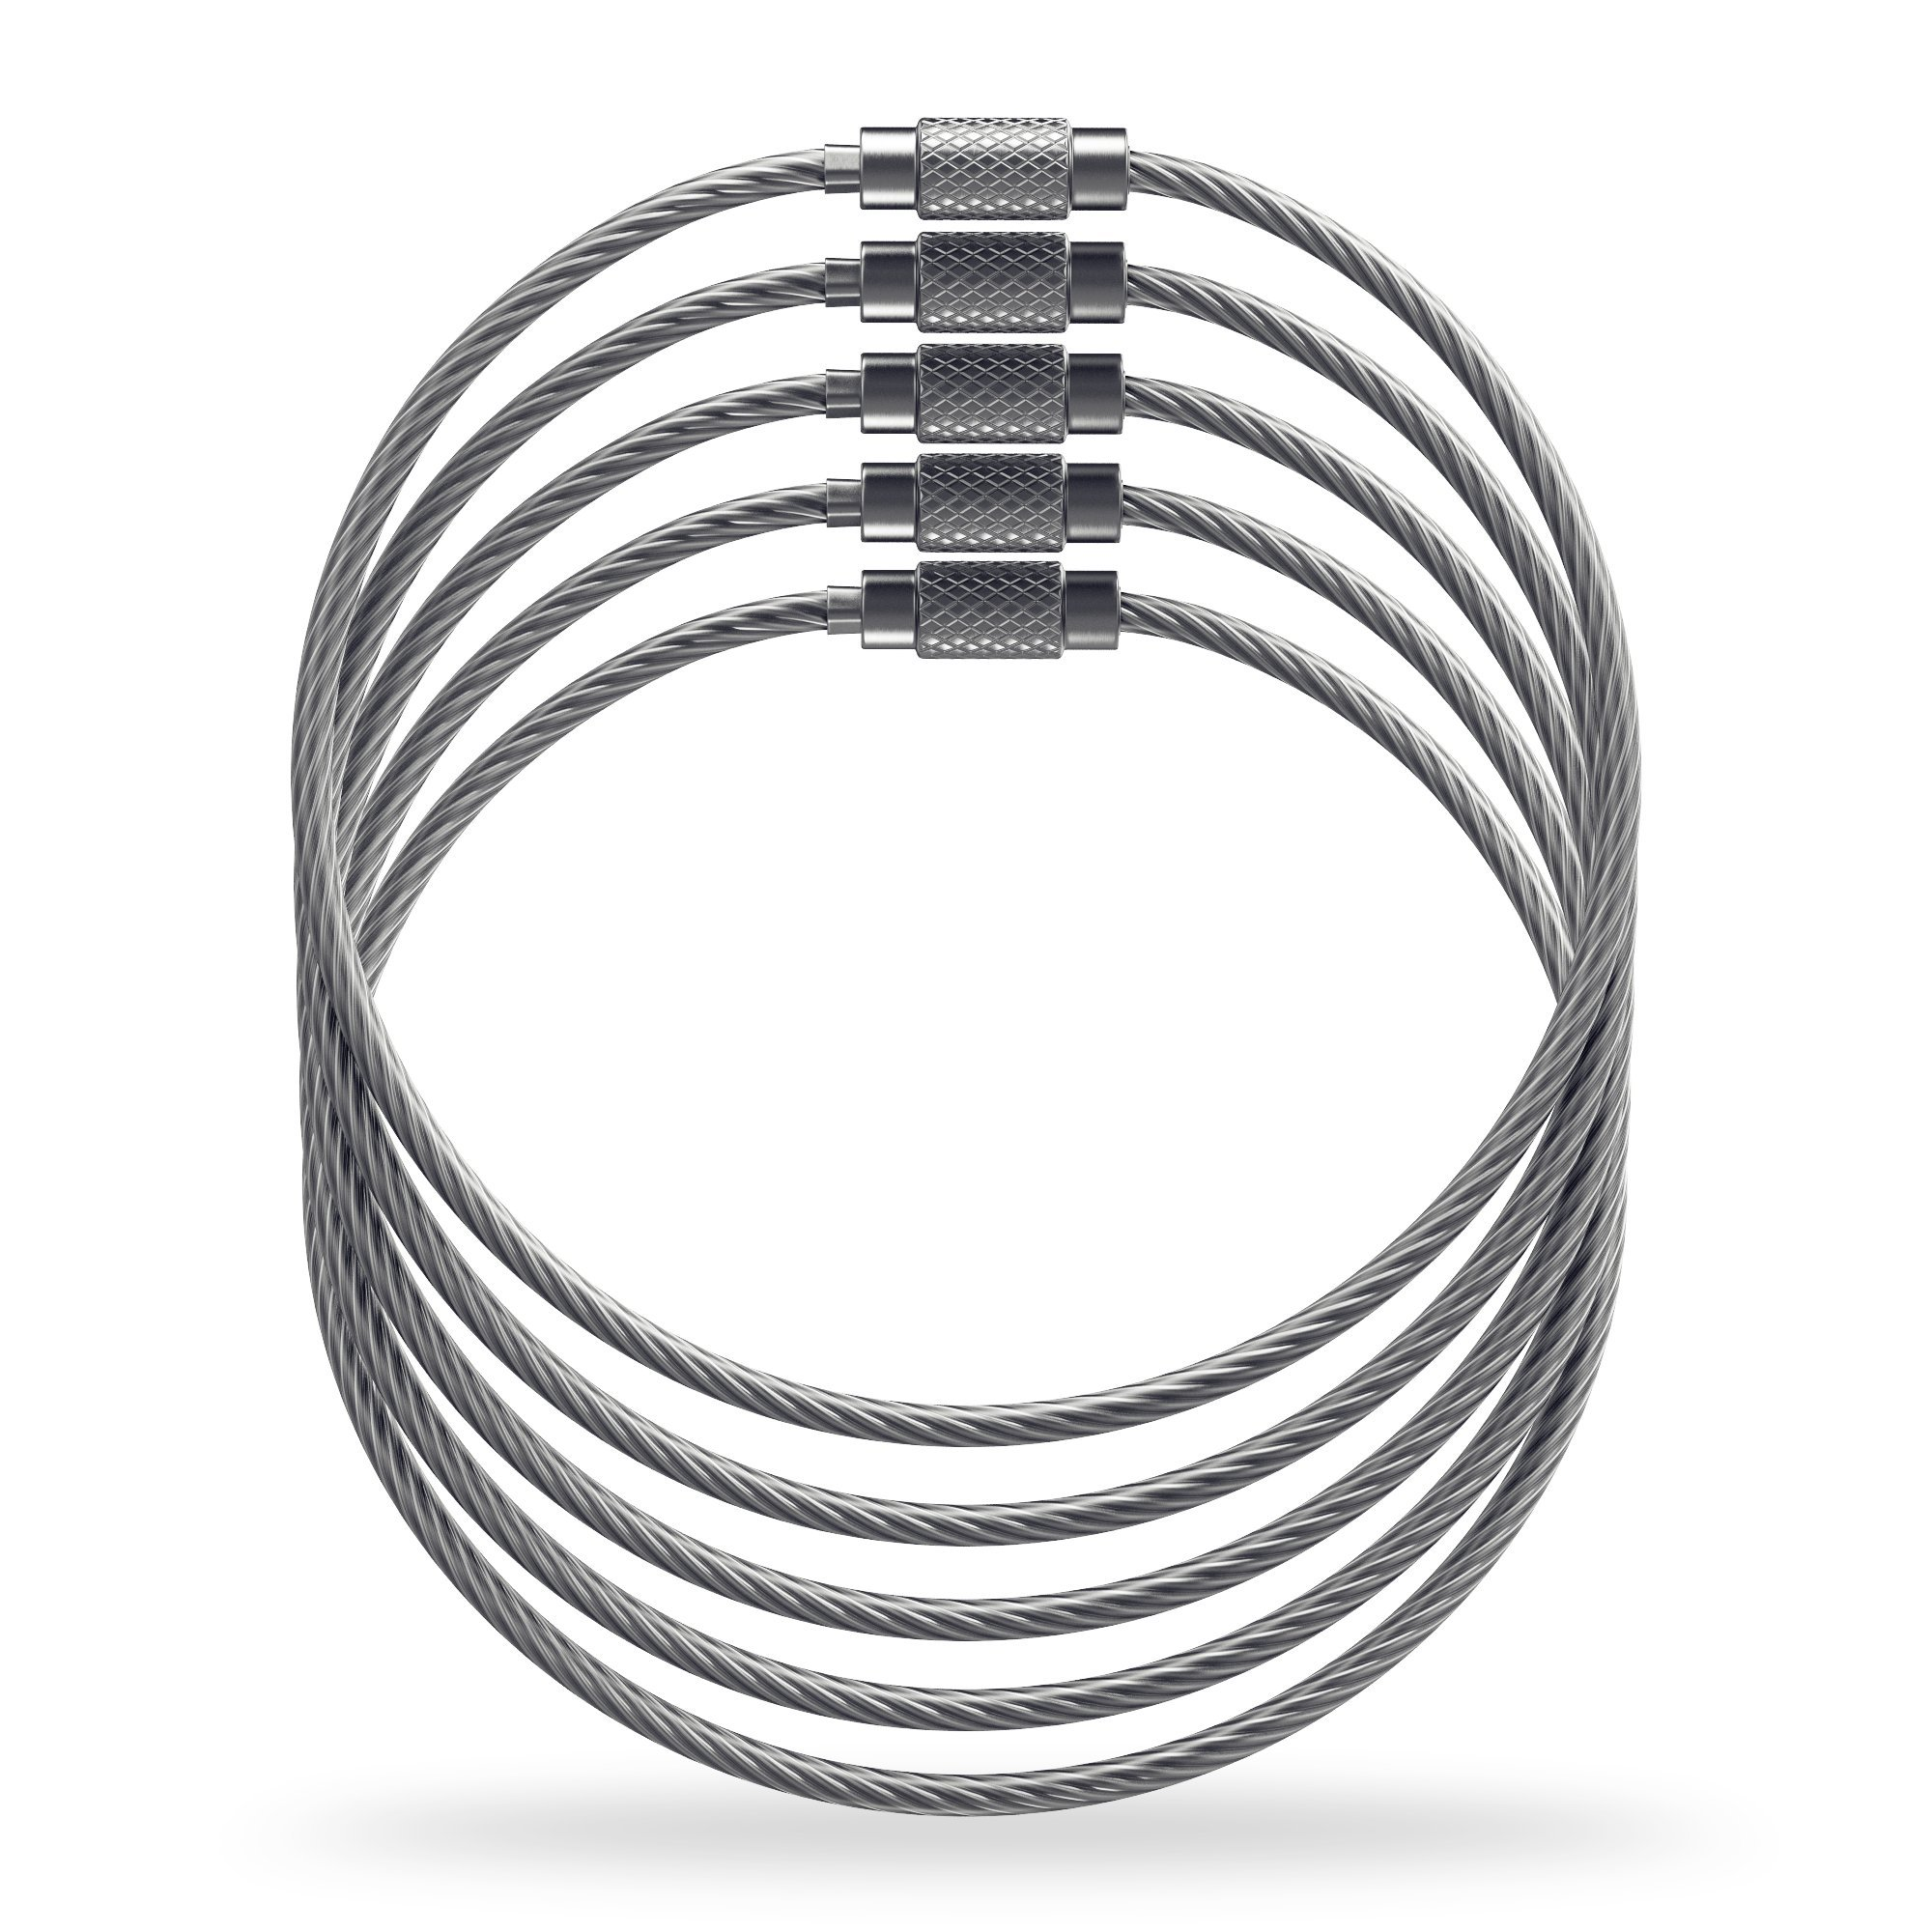 Shacke Luggage Tag Loops Stainless Steel Metal Wire